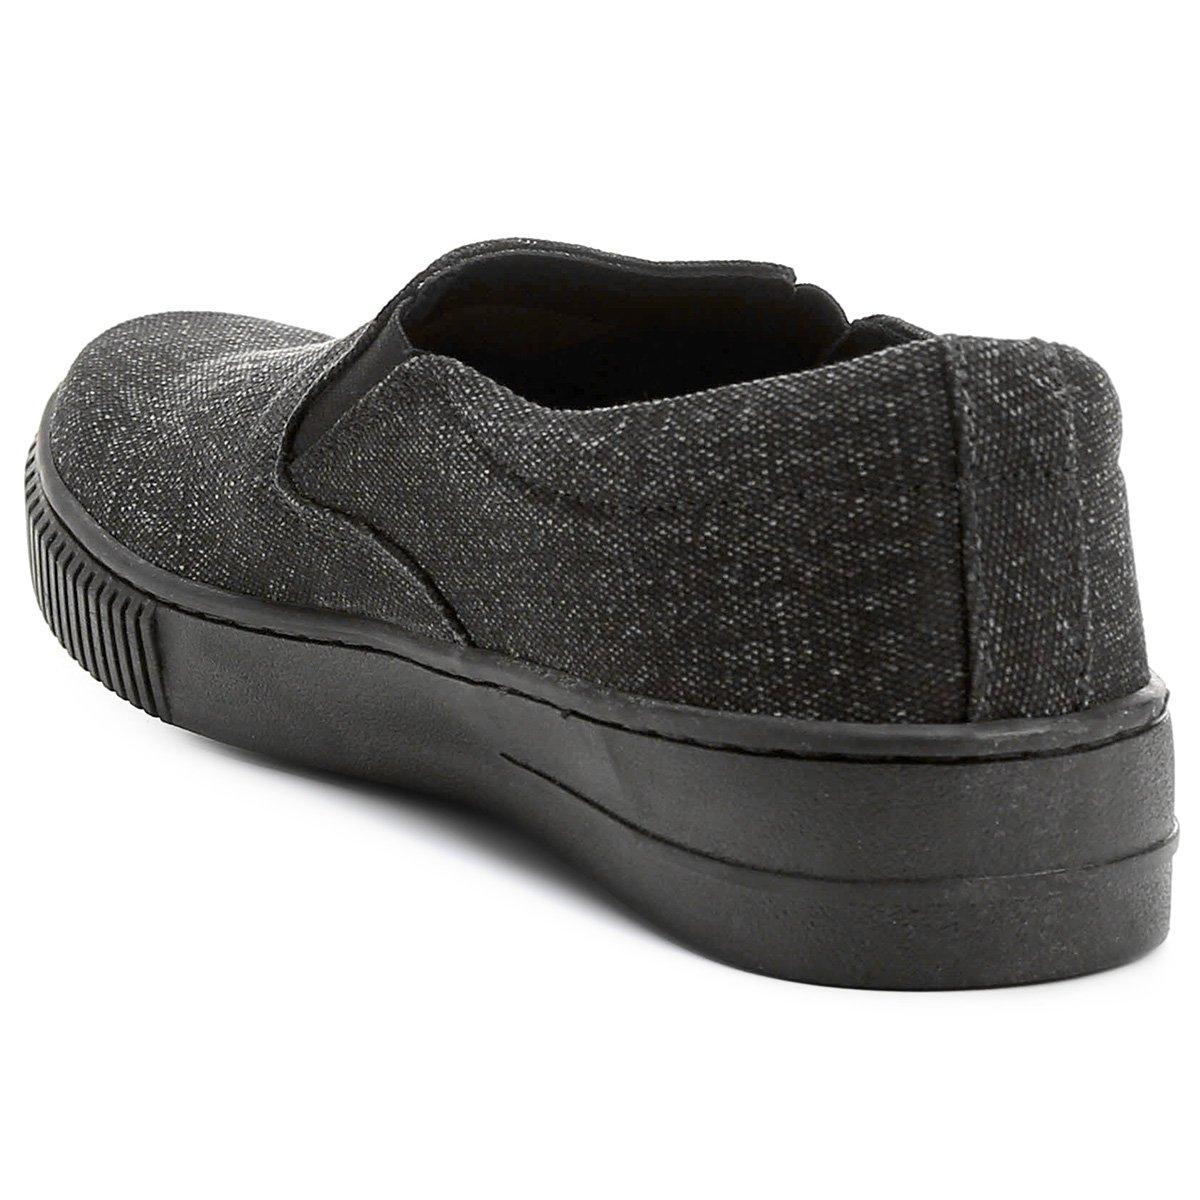 43f7dd0aa0de4 Tênis Calvin Klein Iate Lona - Compre Agora   Netshoes